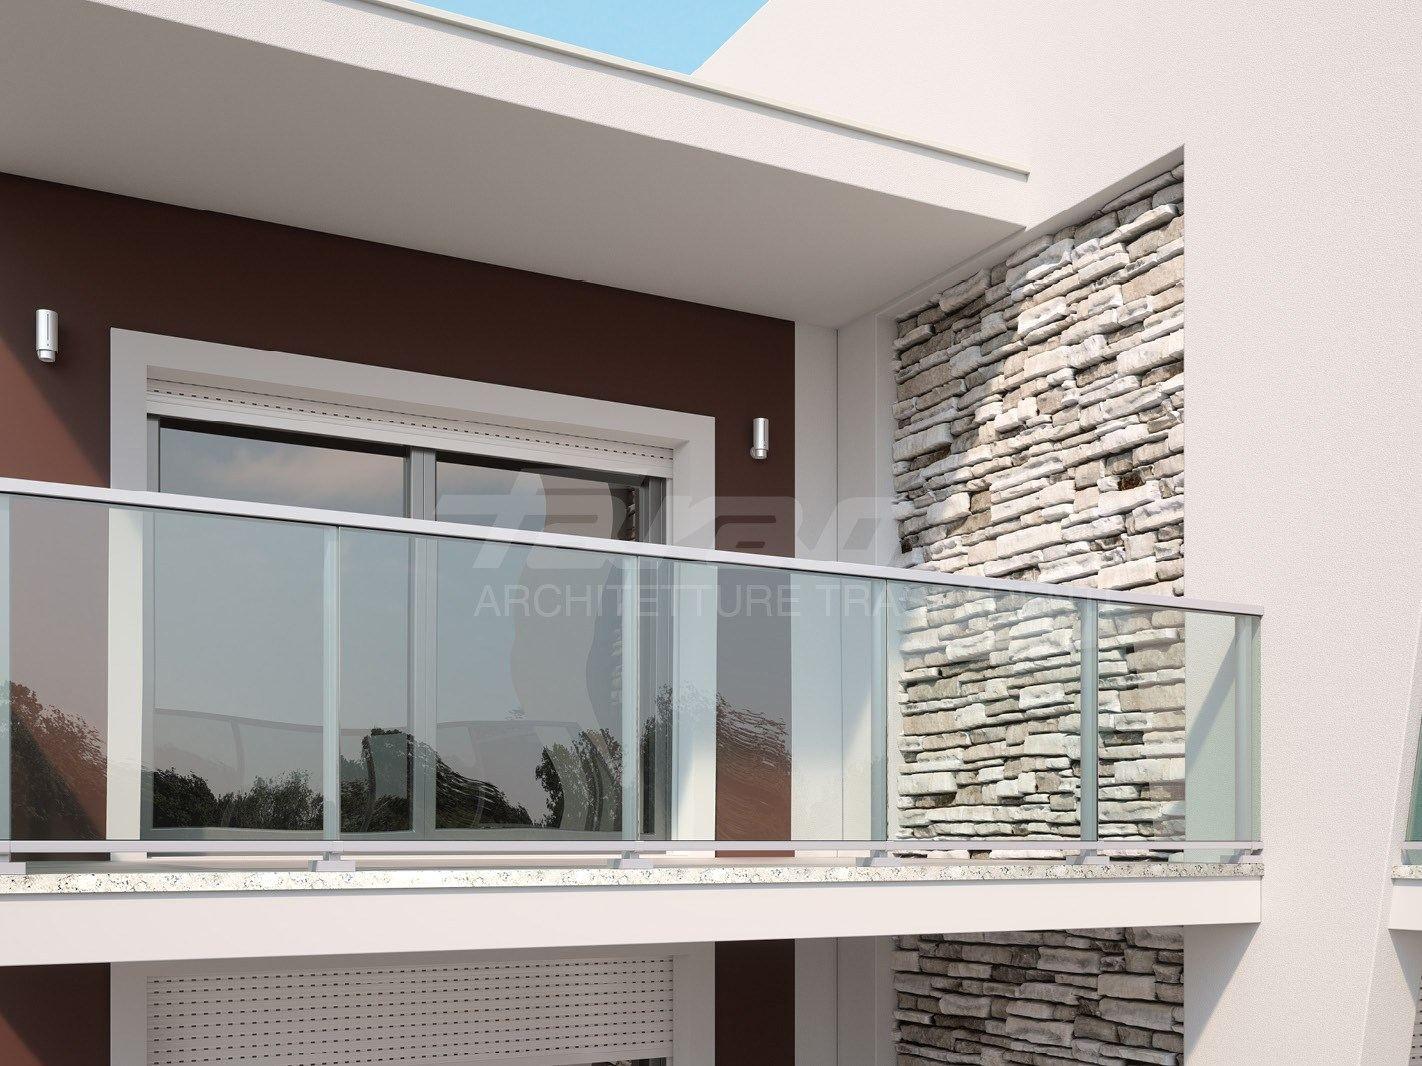 Baranda de escalera en aluminio y vidrio maior colors one for Escalera aluminio pequena